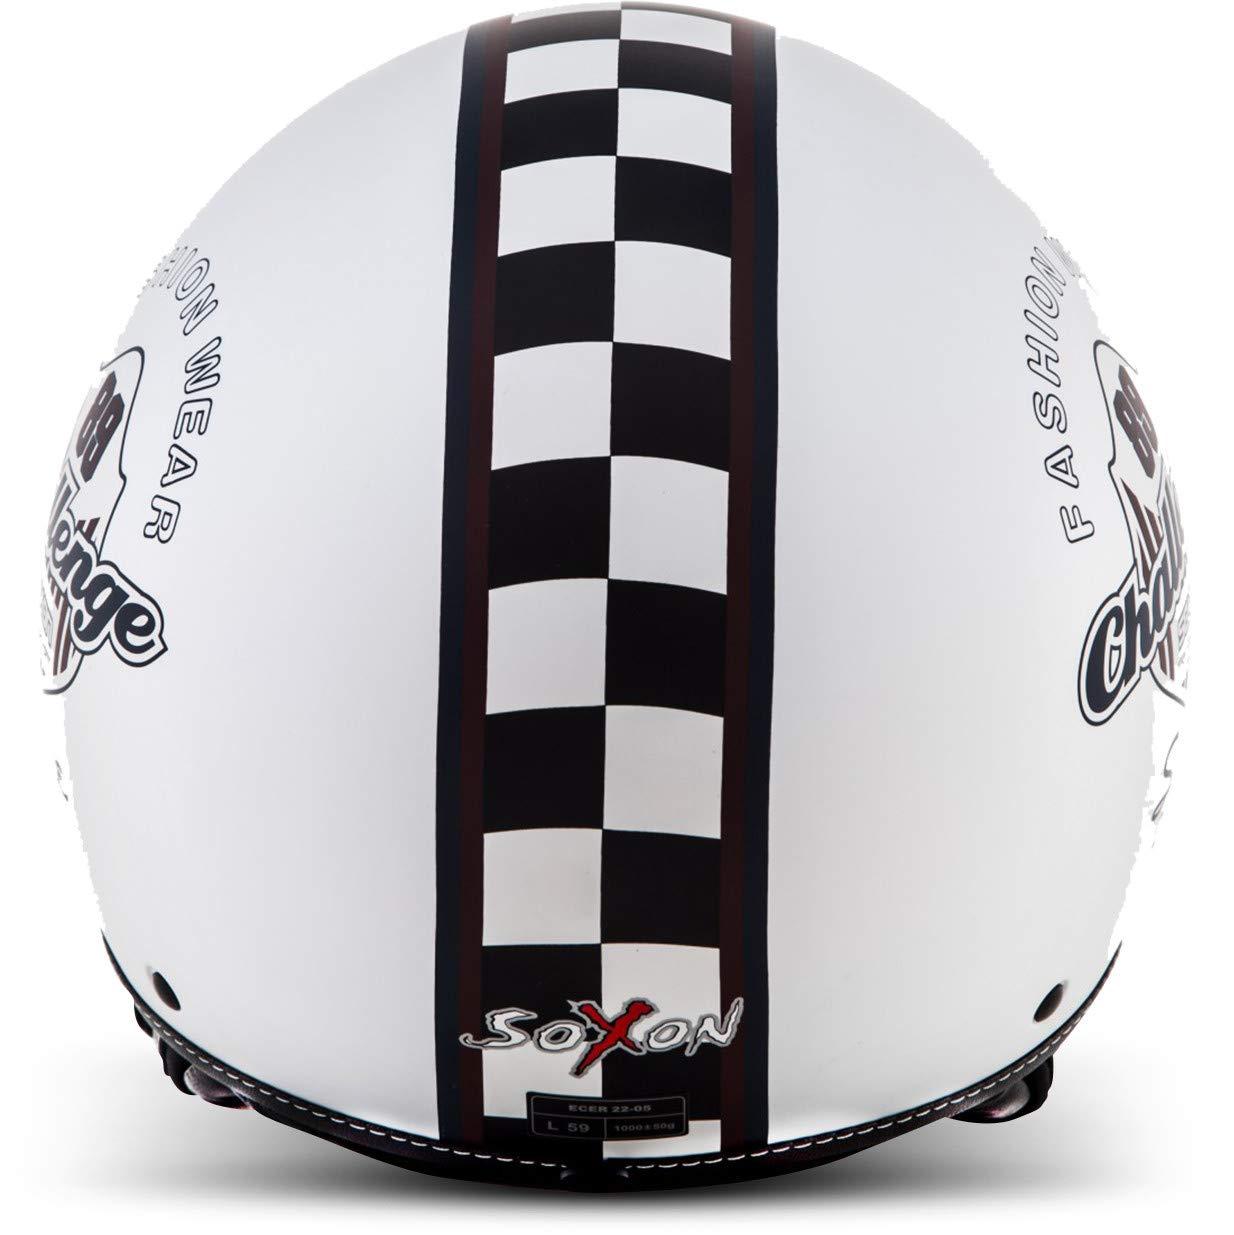 SOXON SP-301 Snow Moto-Helmet Bobber Scooter-Helmet Cruiser Vespa-Helmet Biker Pilot Retro Vintage Chopper Jet-Helmet Mofa 59-60cm incl White Cloth Bag ECE certified L Snow